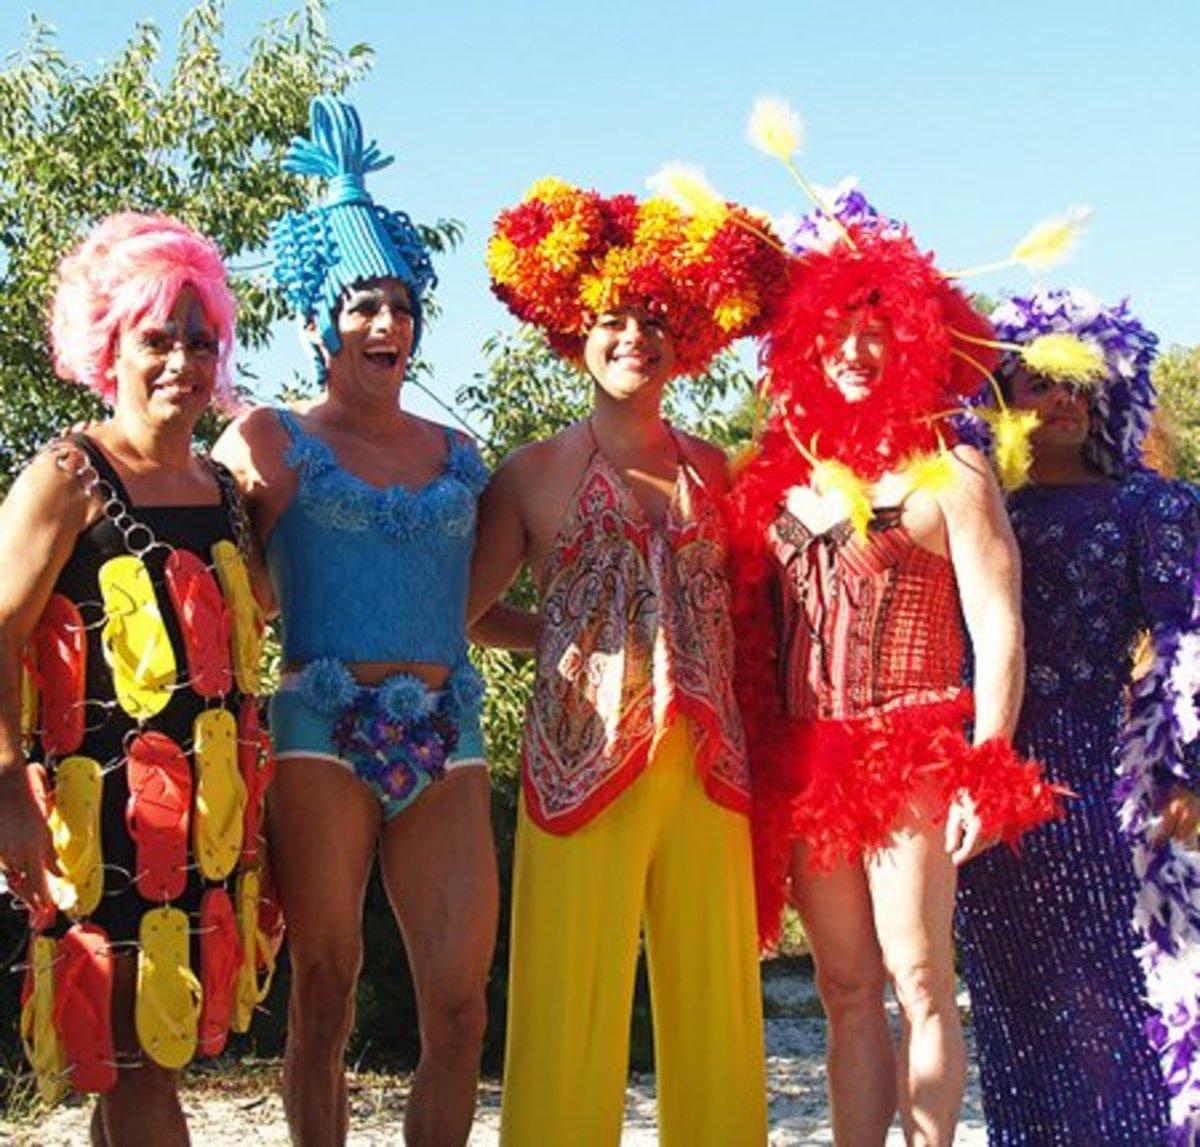 Priscilla Queen of the Desert Group Costume